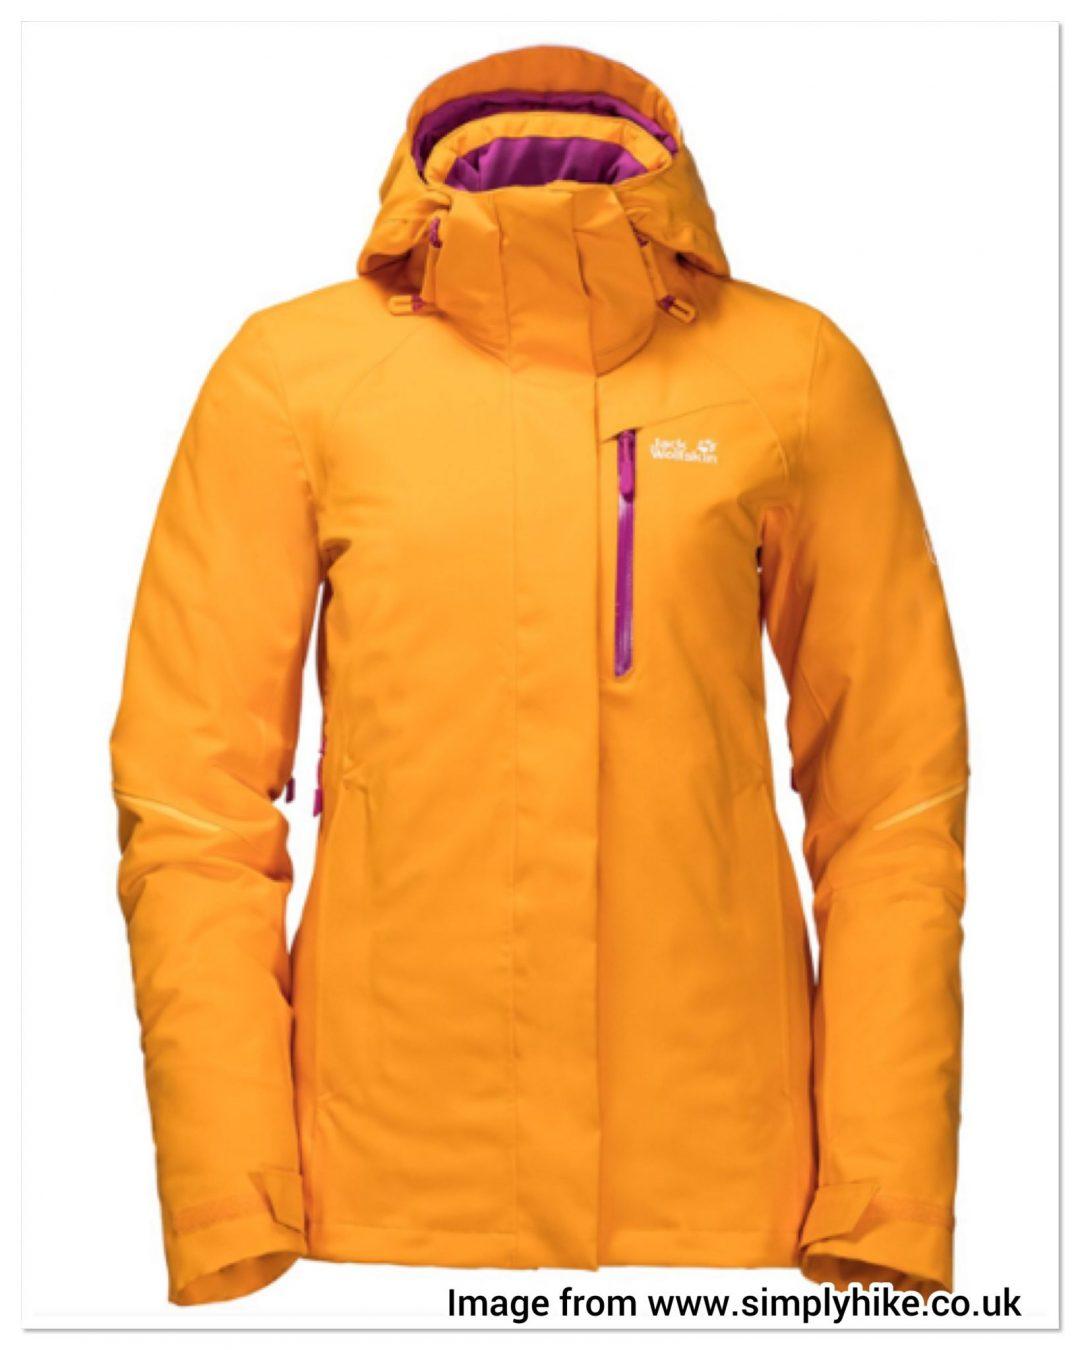 Jack Wolfskin Simply Hike waterproof jacket